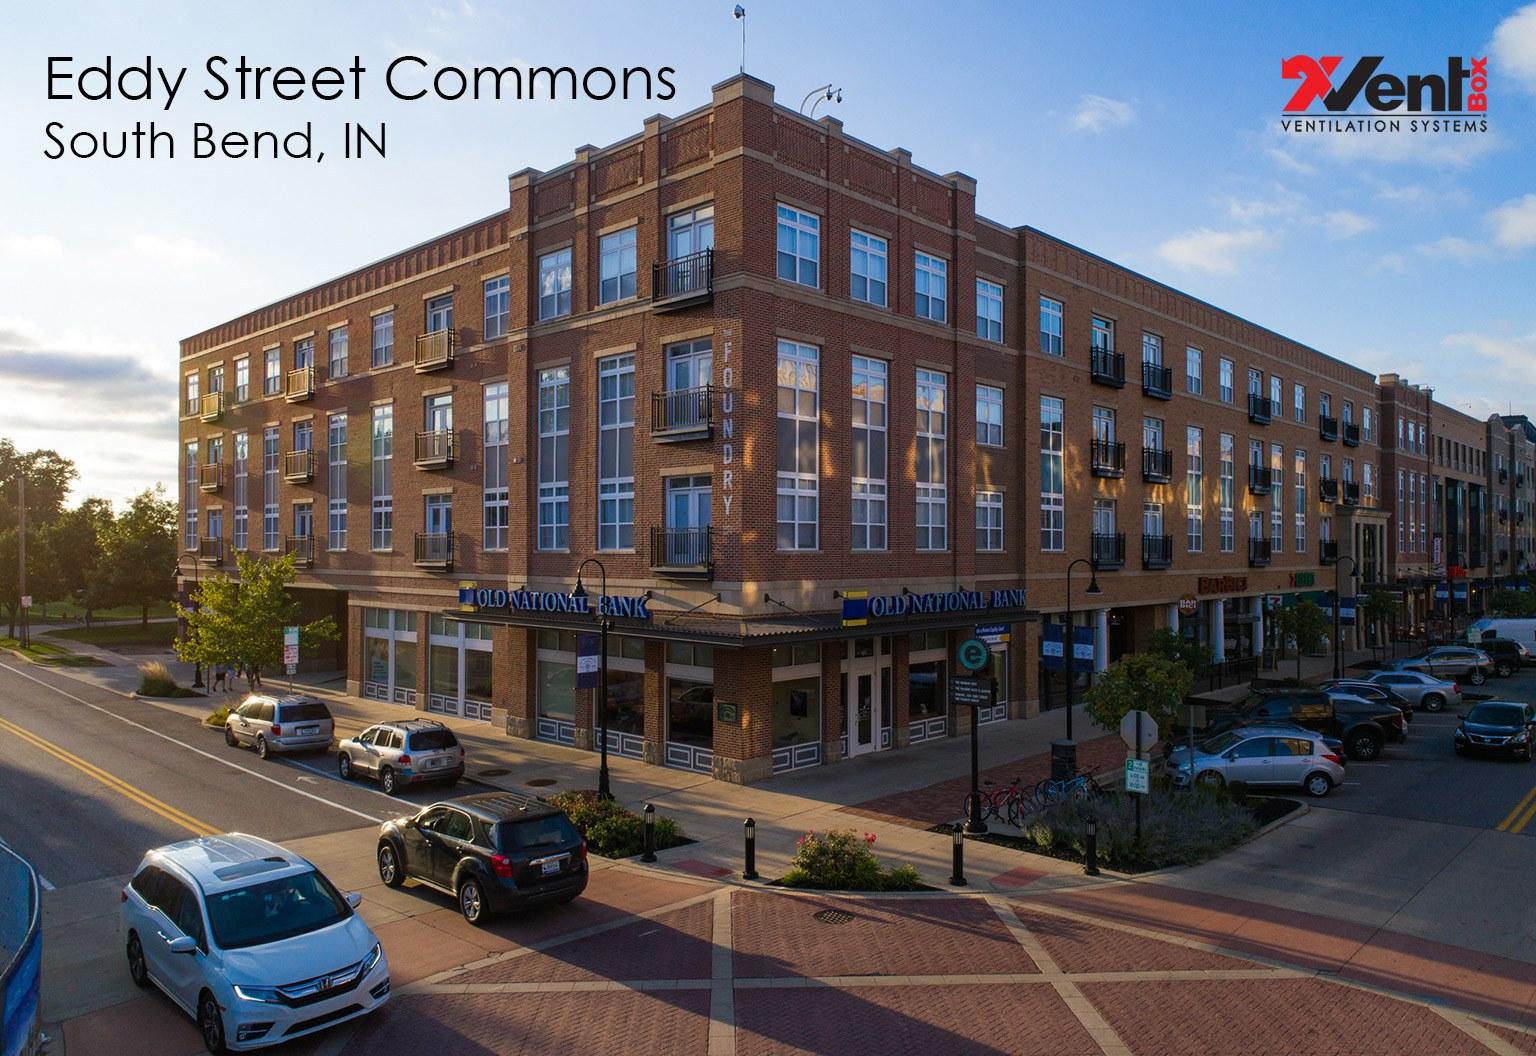 Eddy Street Commons